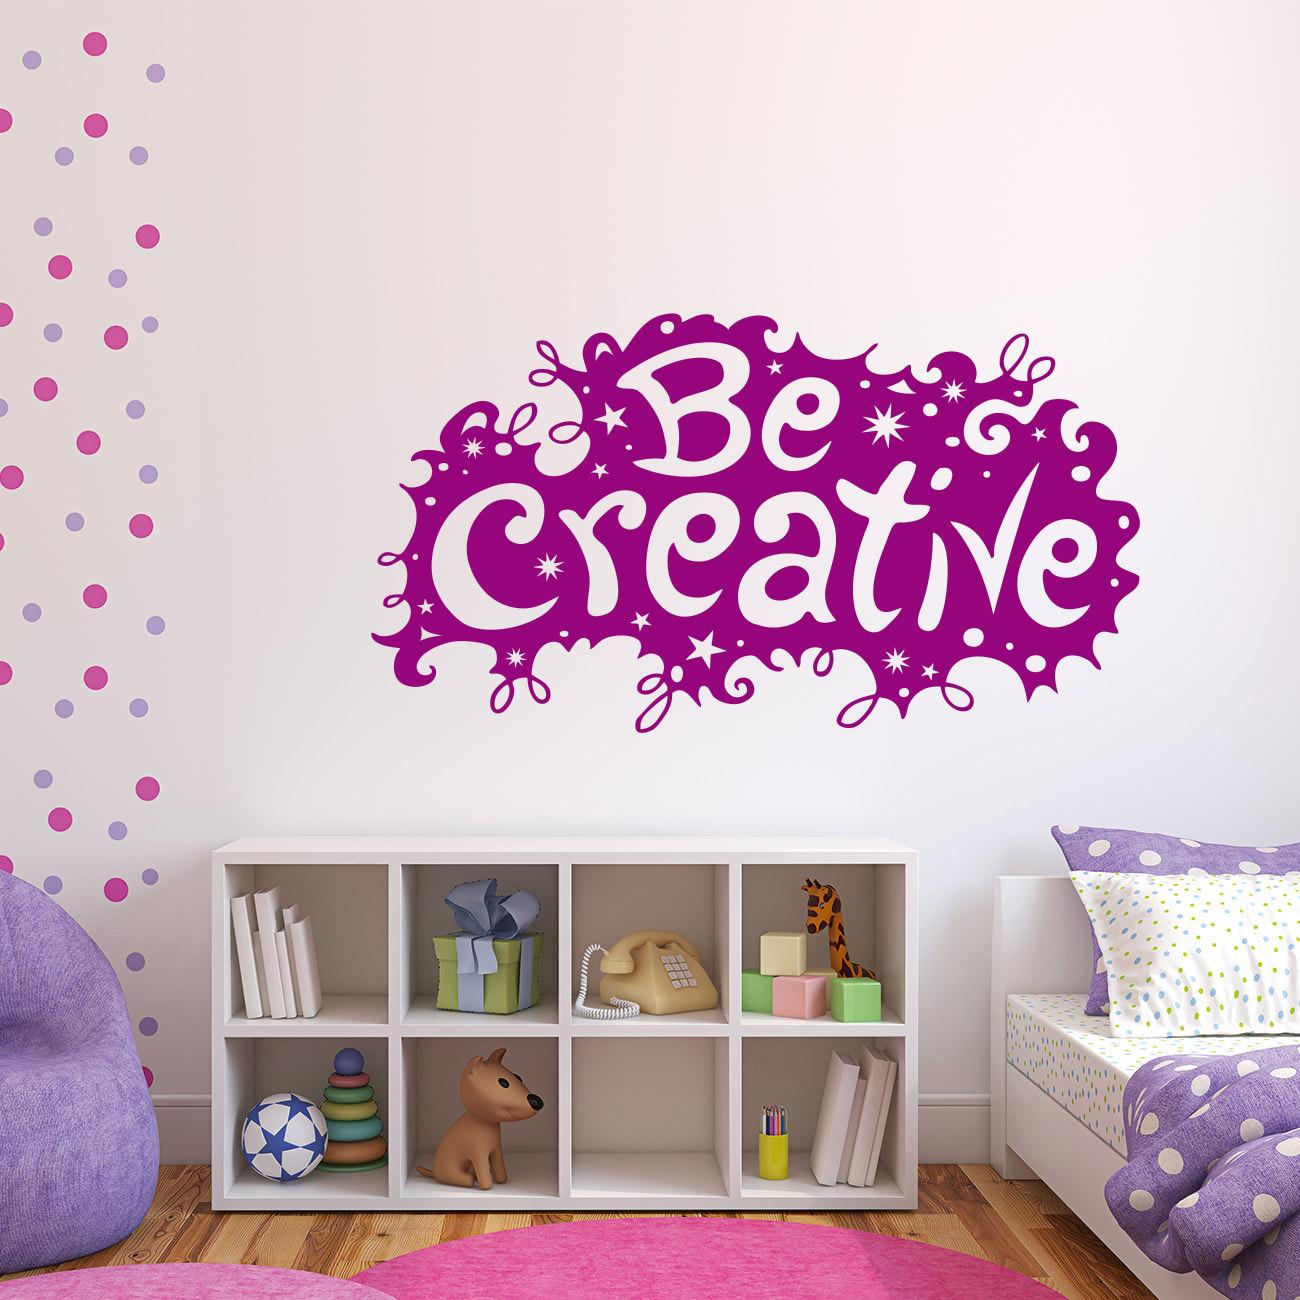 creative f r wohnzimmer kinderzimmer wandtattoo sunnywall online shop. Black Bedroom Furniture Sets. Home Design Ideas